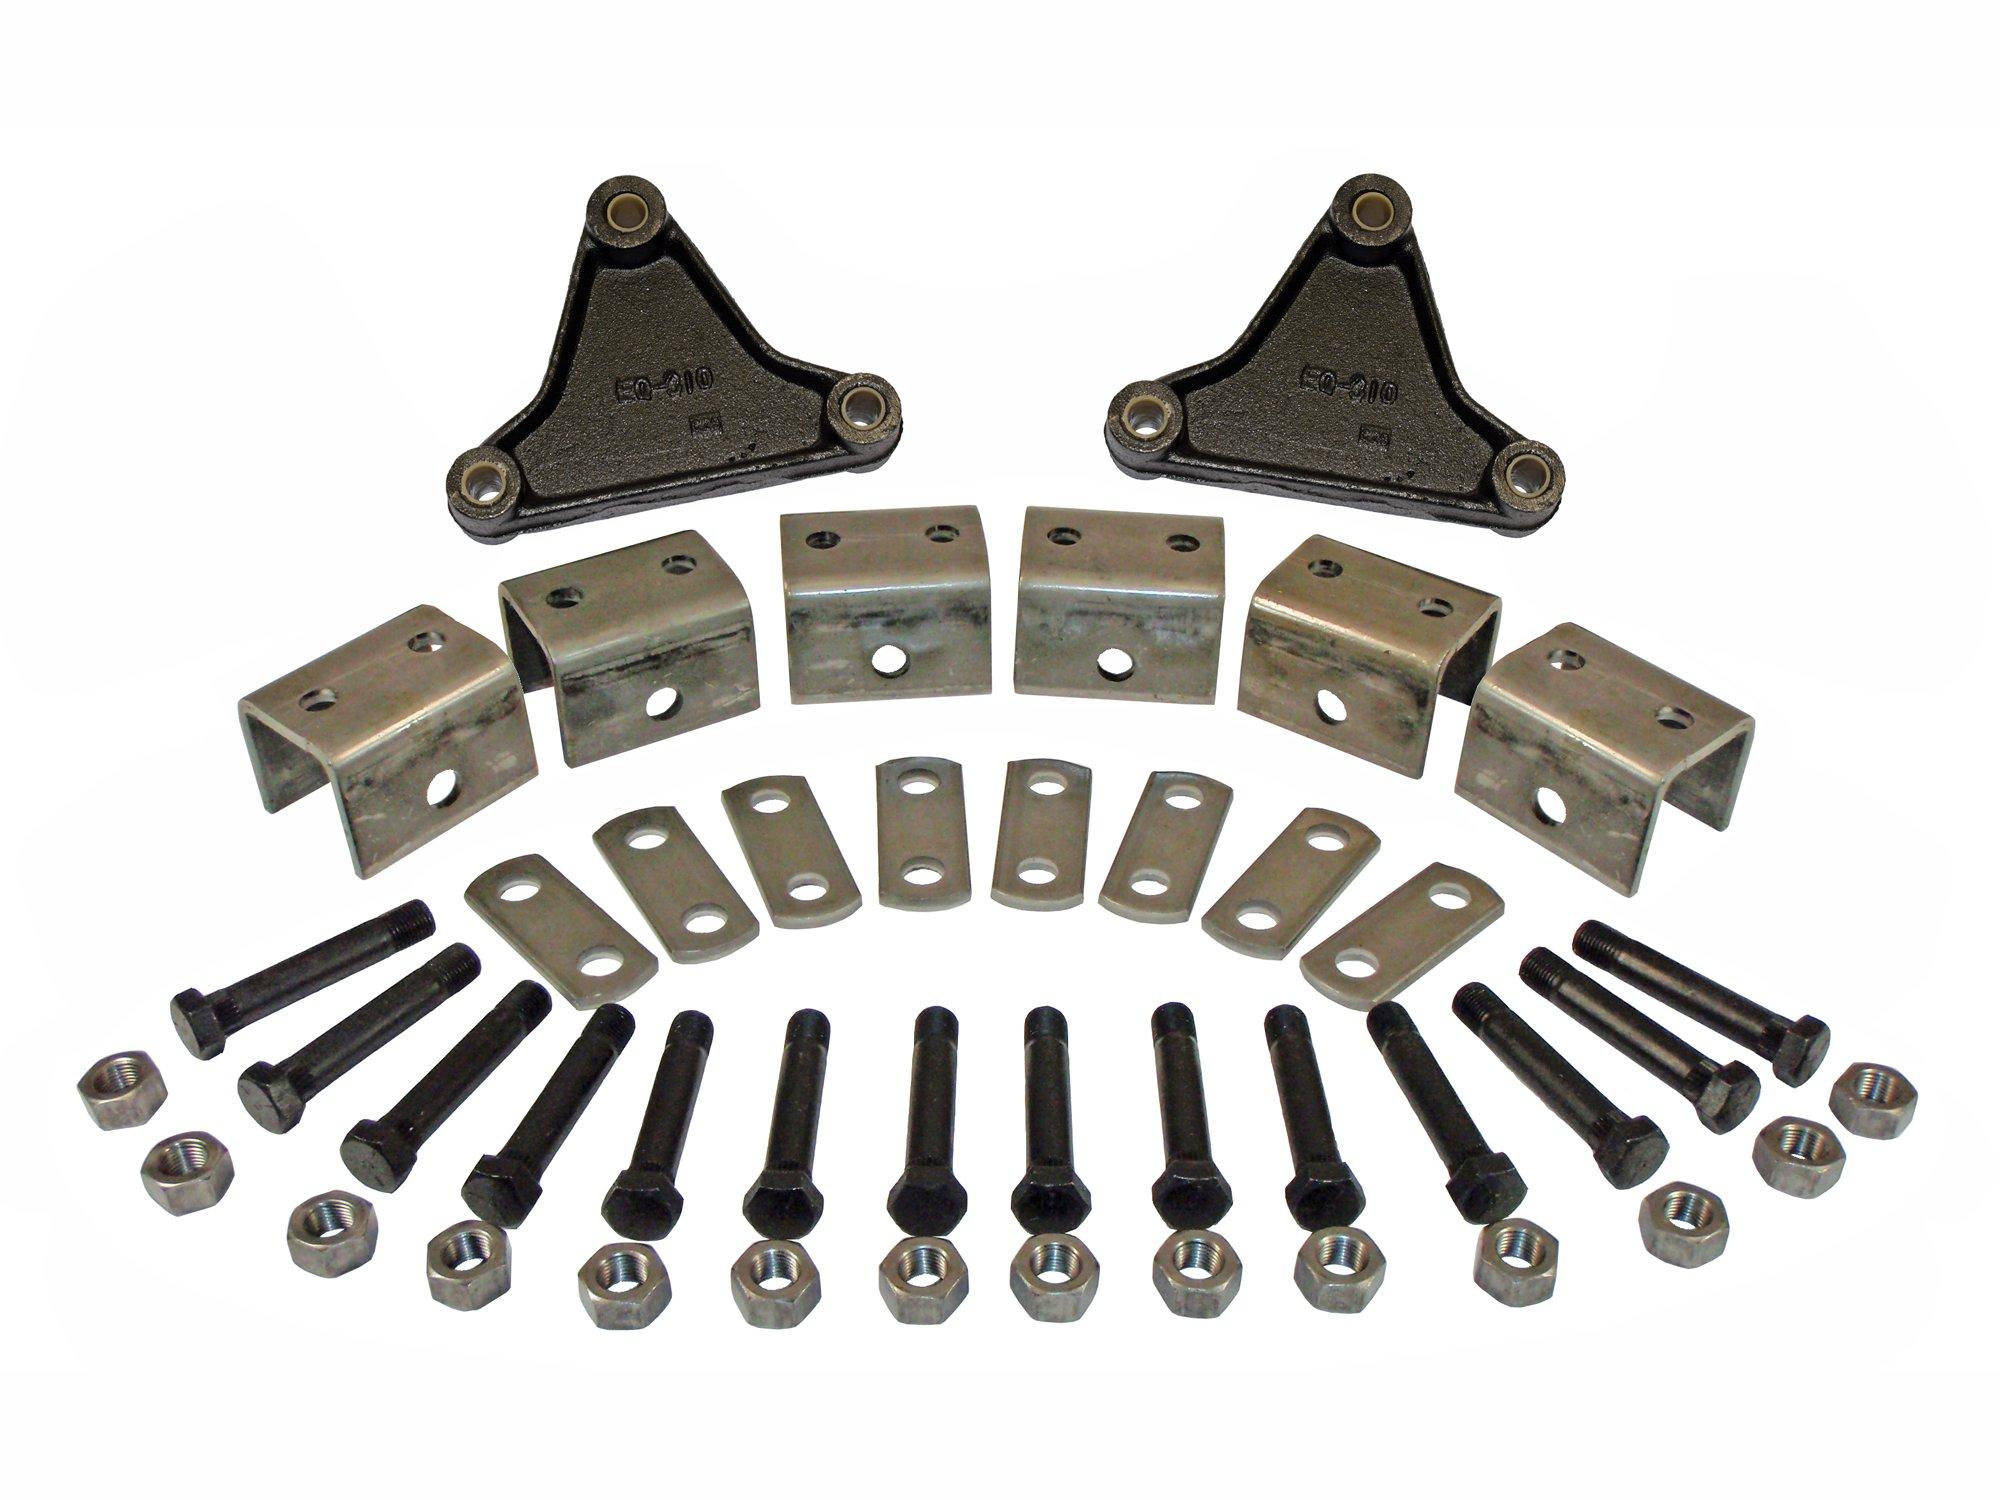 Tandem Axle Hanger Kit (EK2-D102) For Double Eye Springs by Rigid Hitch